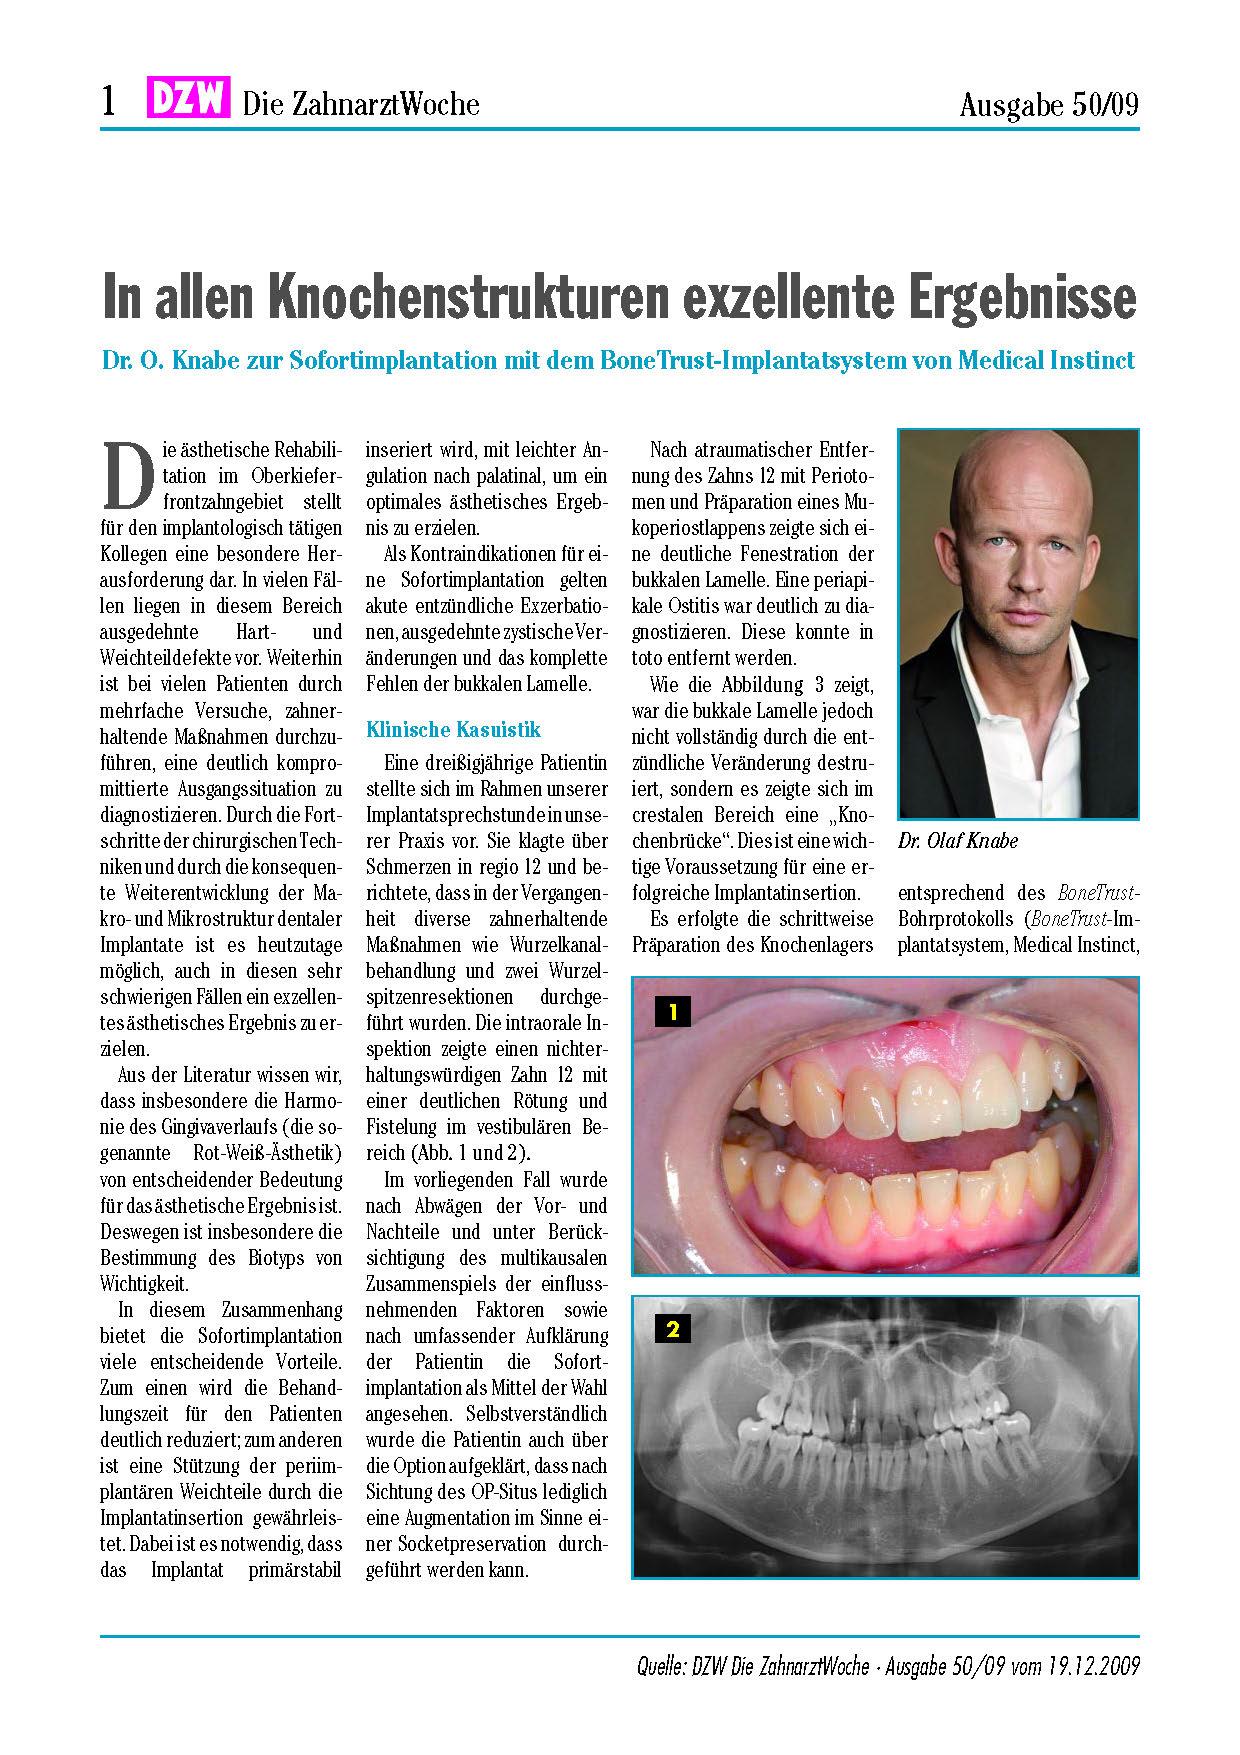 Exzellente Ergebnisse mit BoneTrust® Implantatsystem